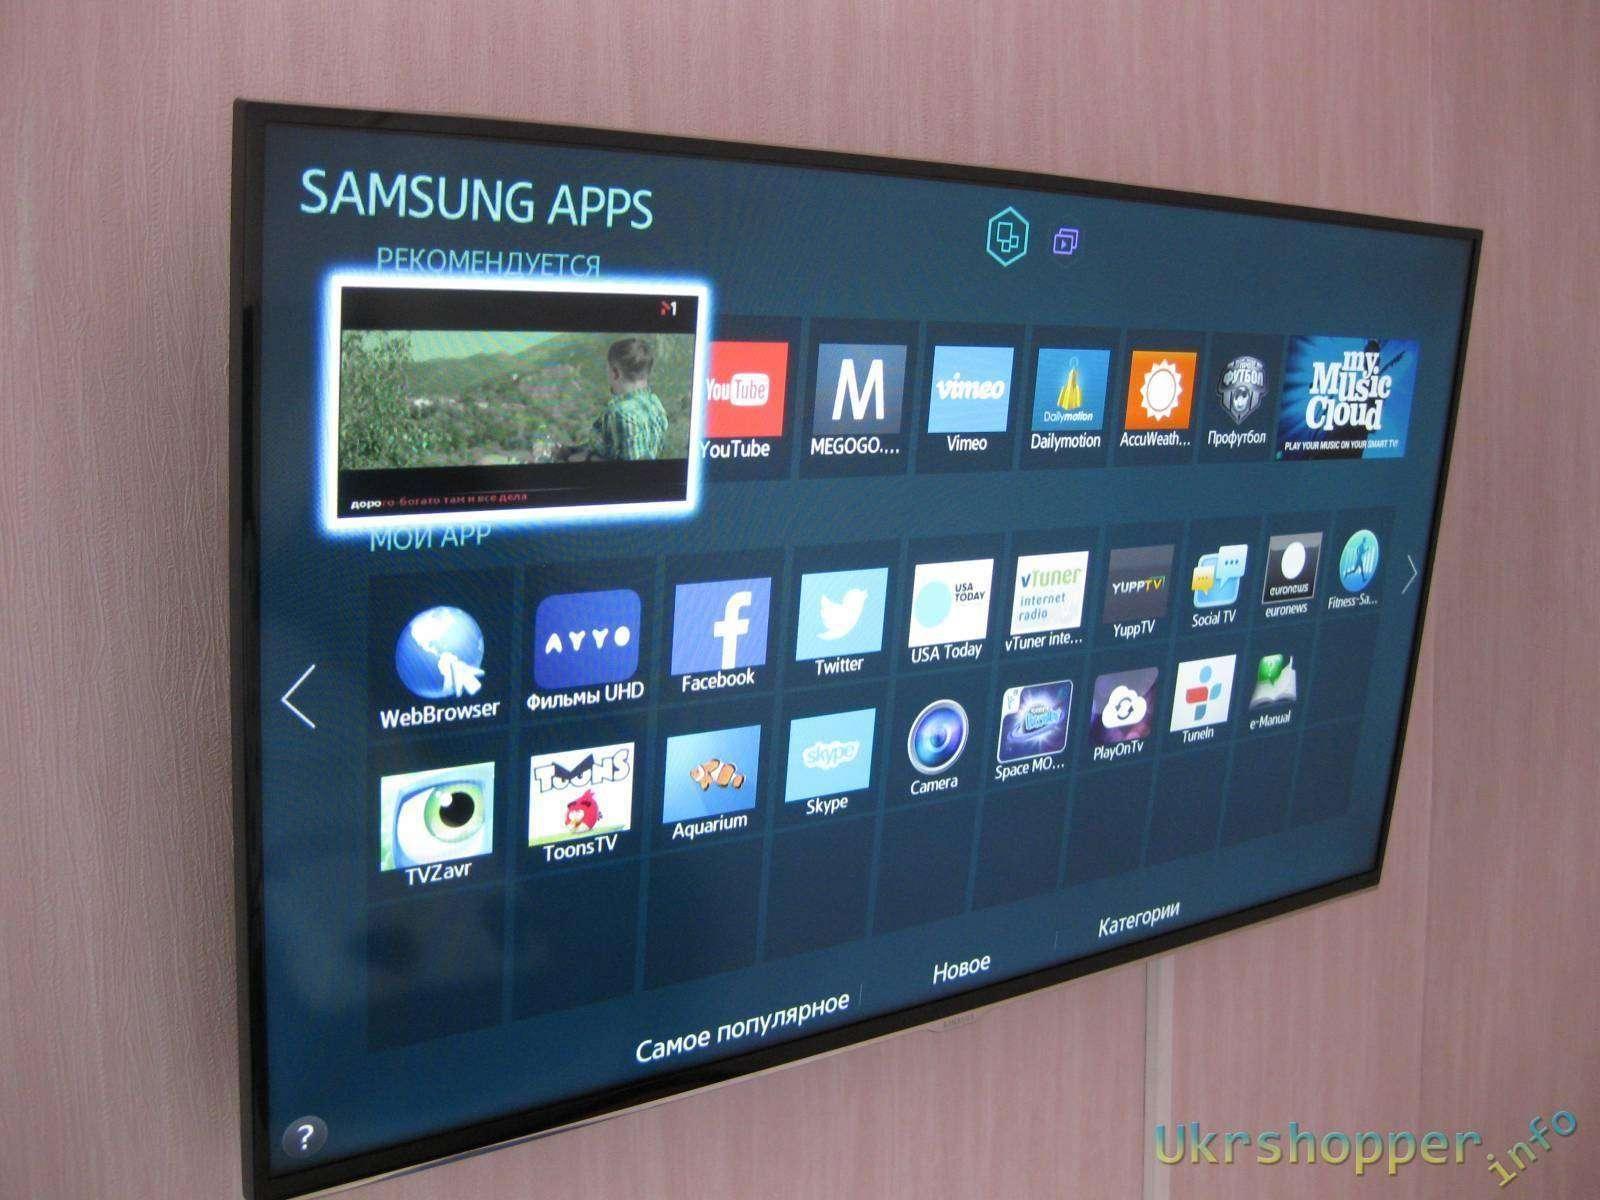 Другие - Украина: LED Телевизор Samsung H5500 40 дюймов, 1920*1080, Wifi, smart tv